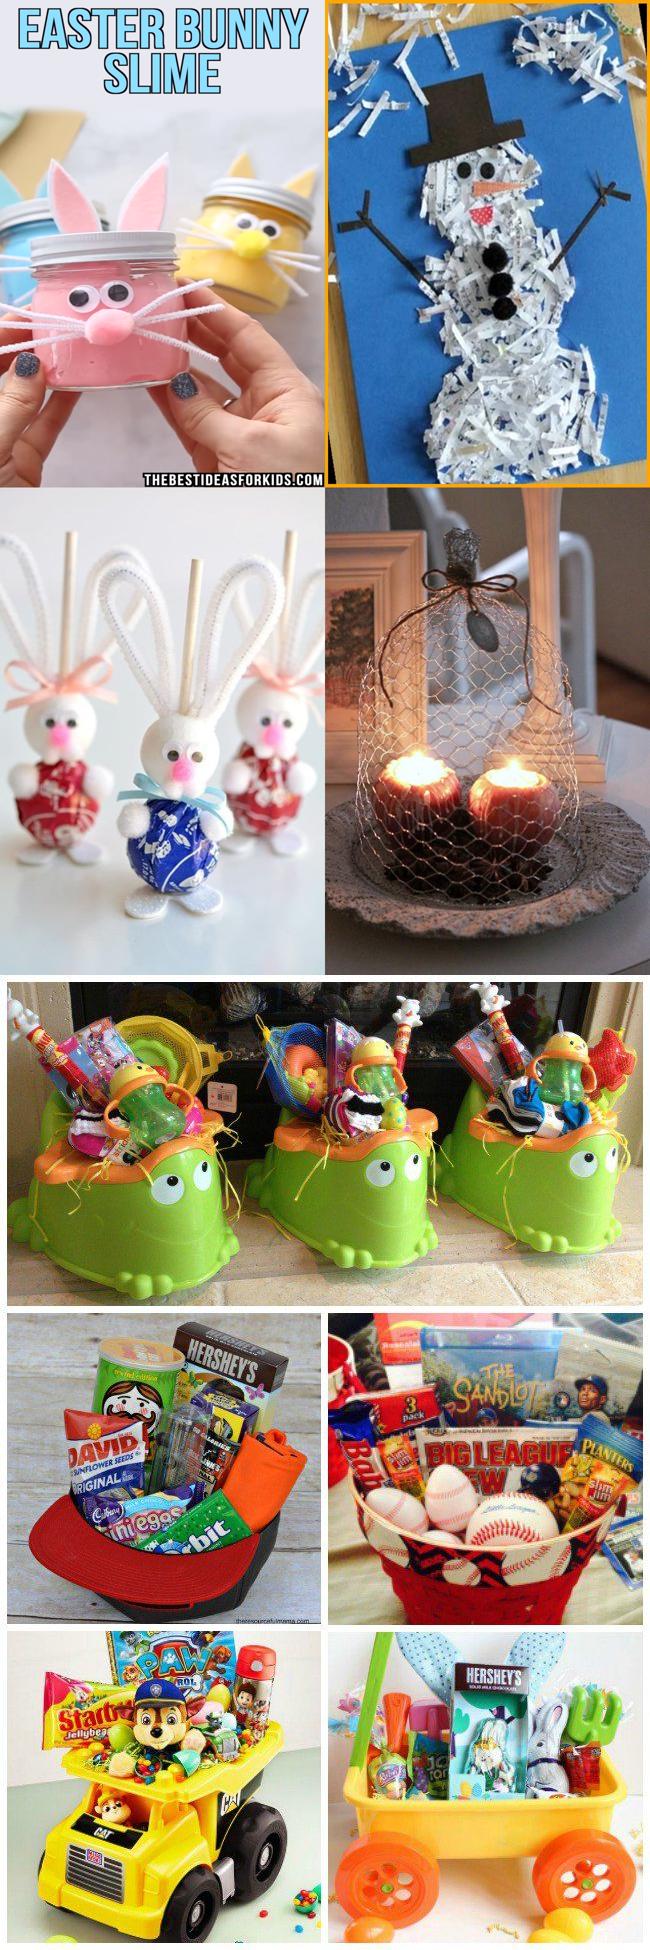 Best Easter Crafts For Toddlers Basket Ideas 2021 12 Creative Easter Basket Ideas In 2021 Creative Easter Baskets Toddler Crafts Easter Crafts